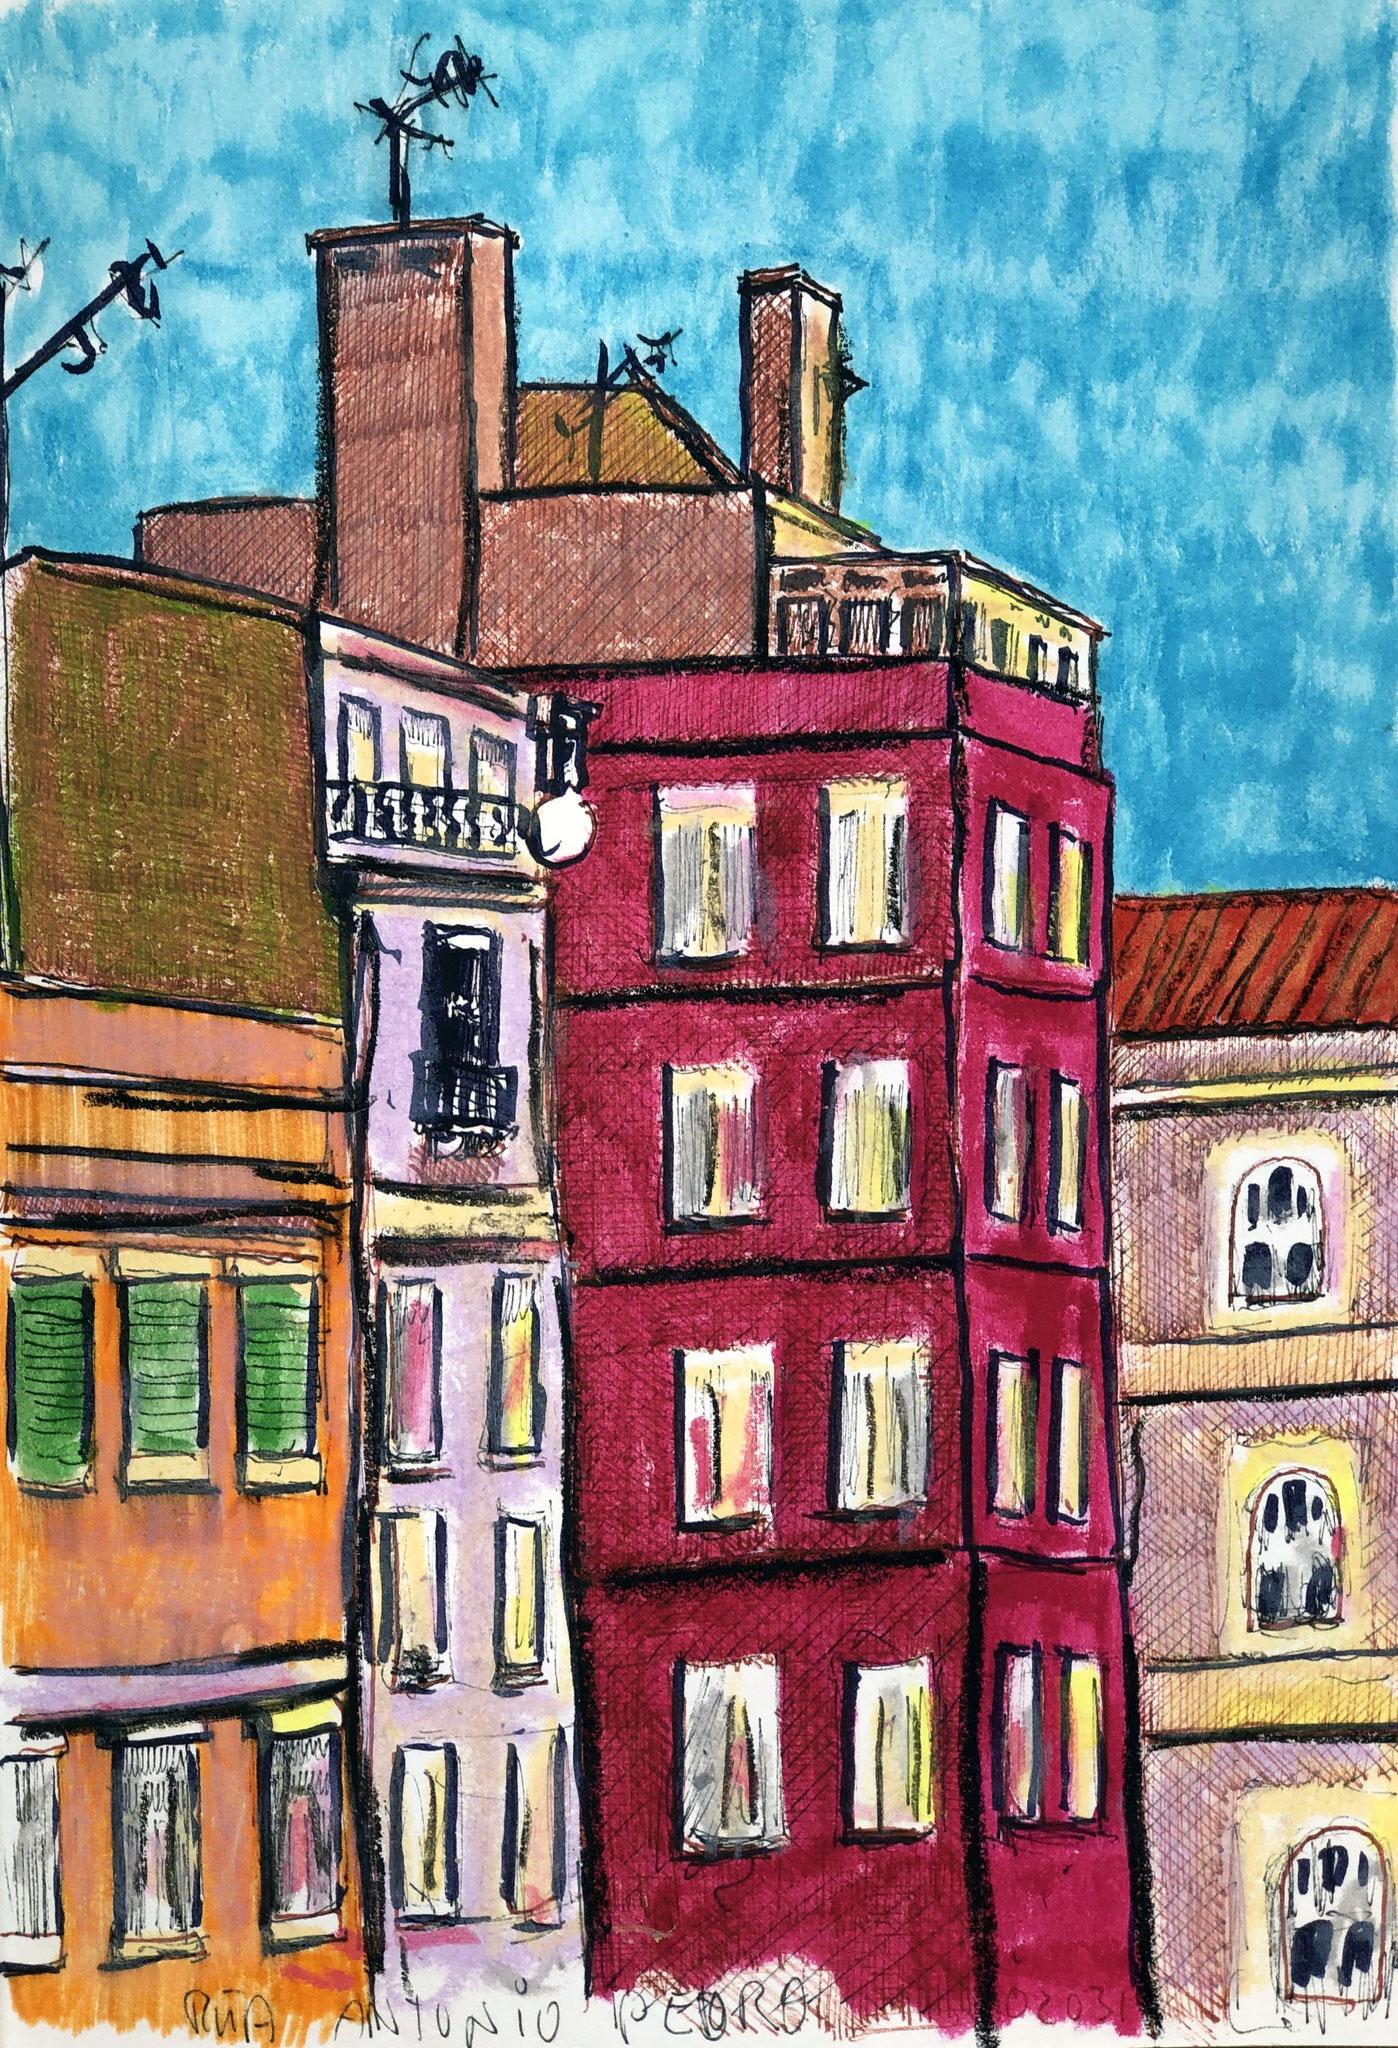 aus meinem Skizzenbuch: LISBOA, RUA ANTONIO PEDRO     Mischtechnik auf Papier - 28 x 20cm